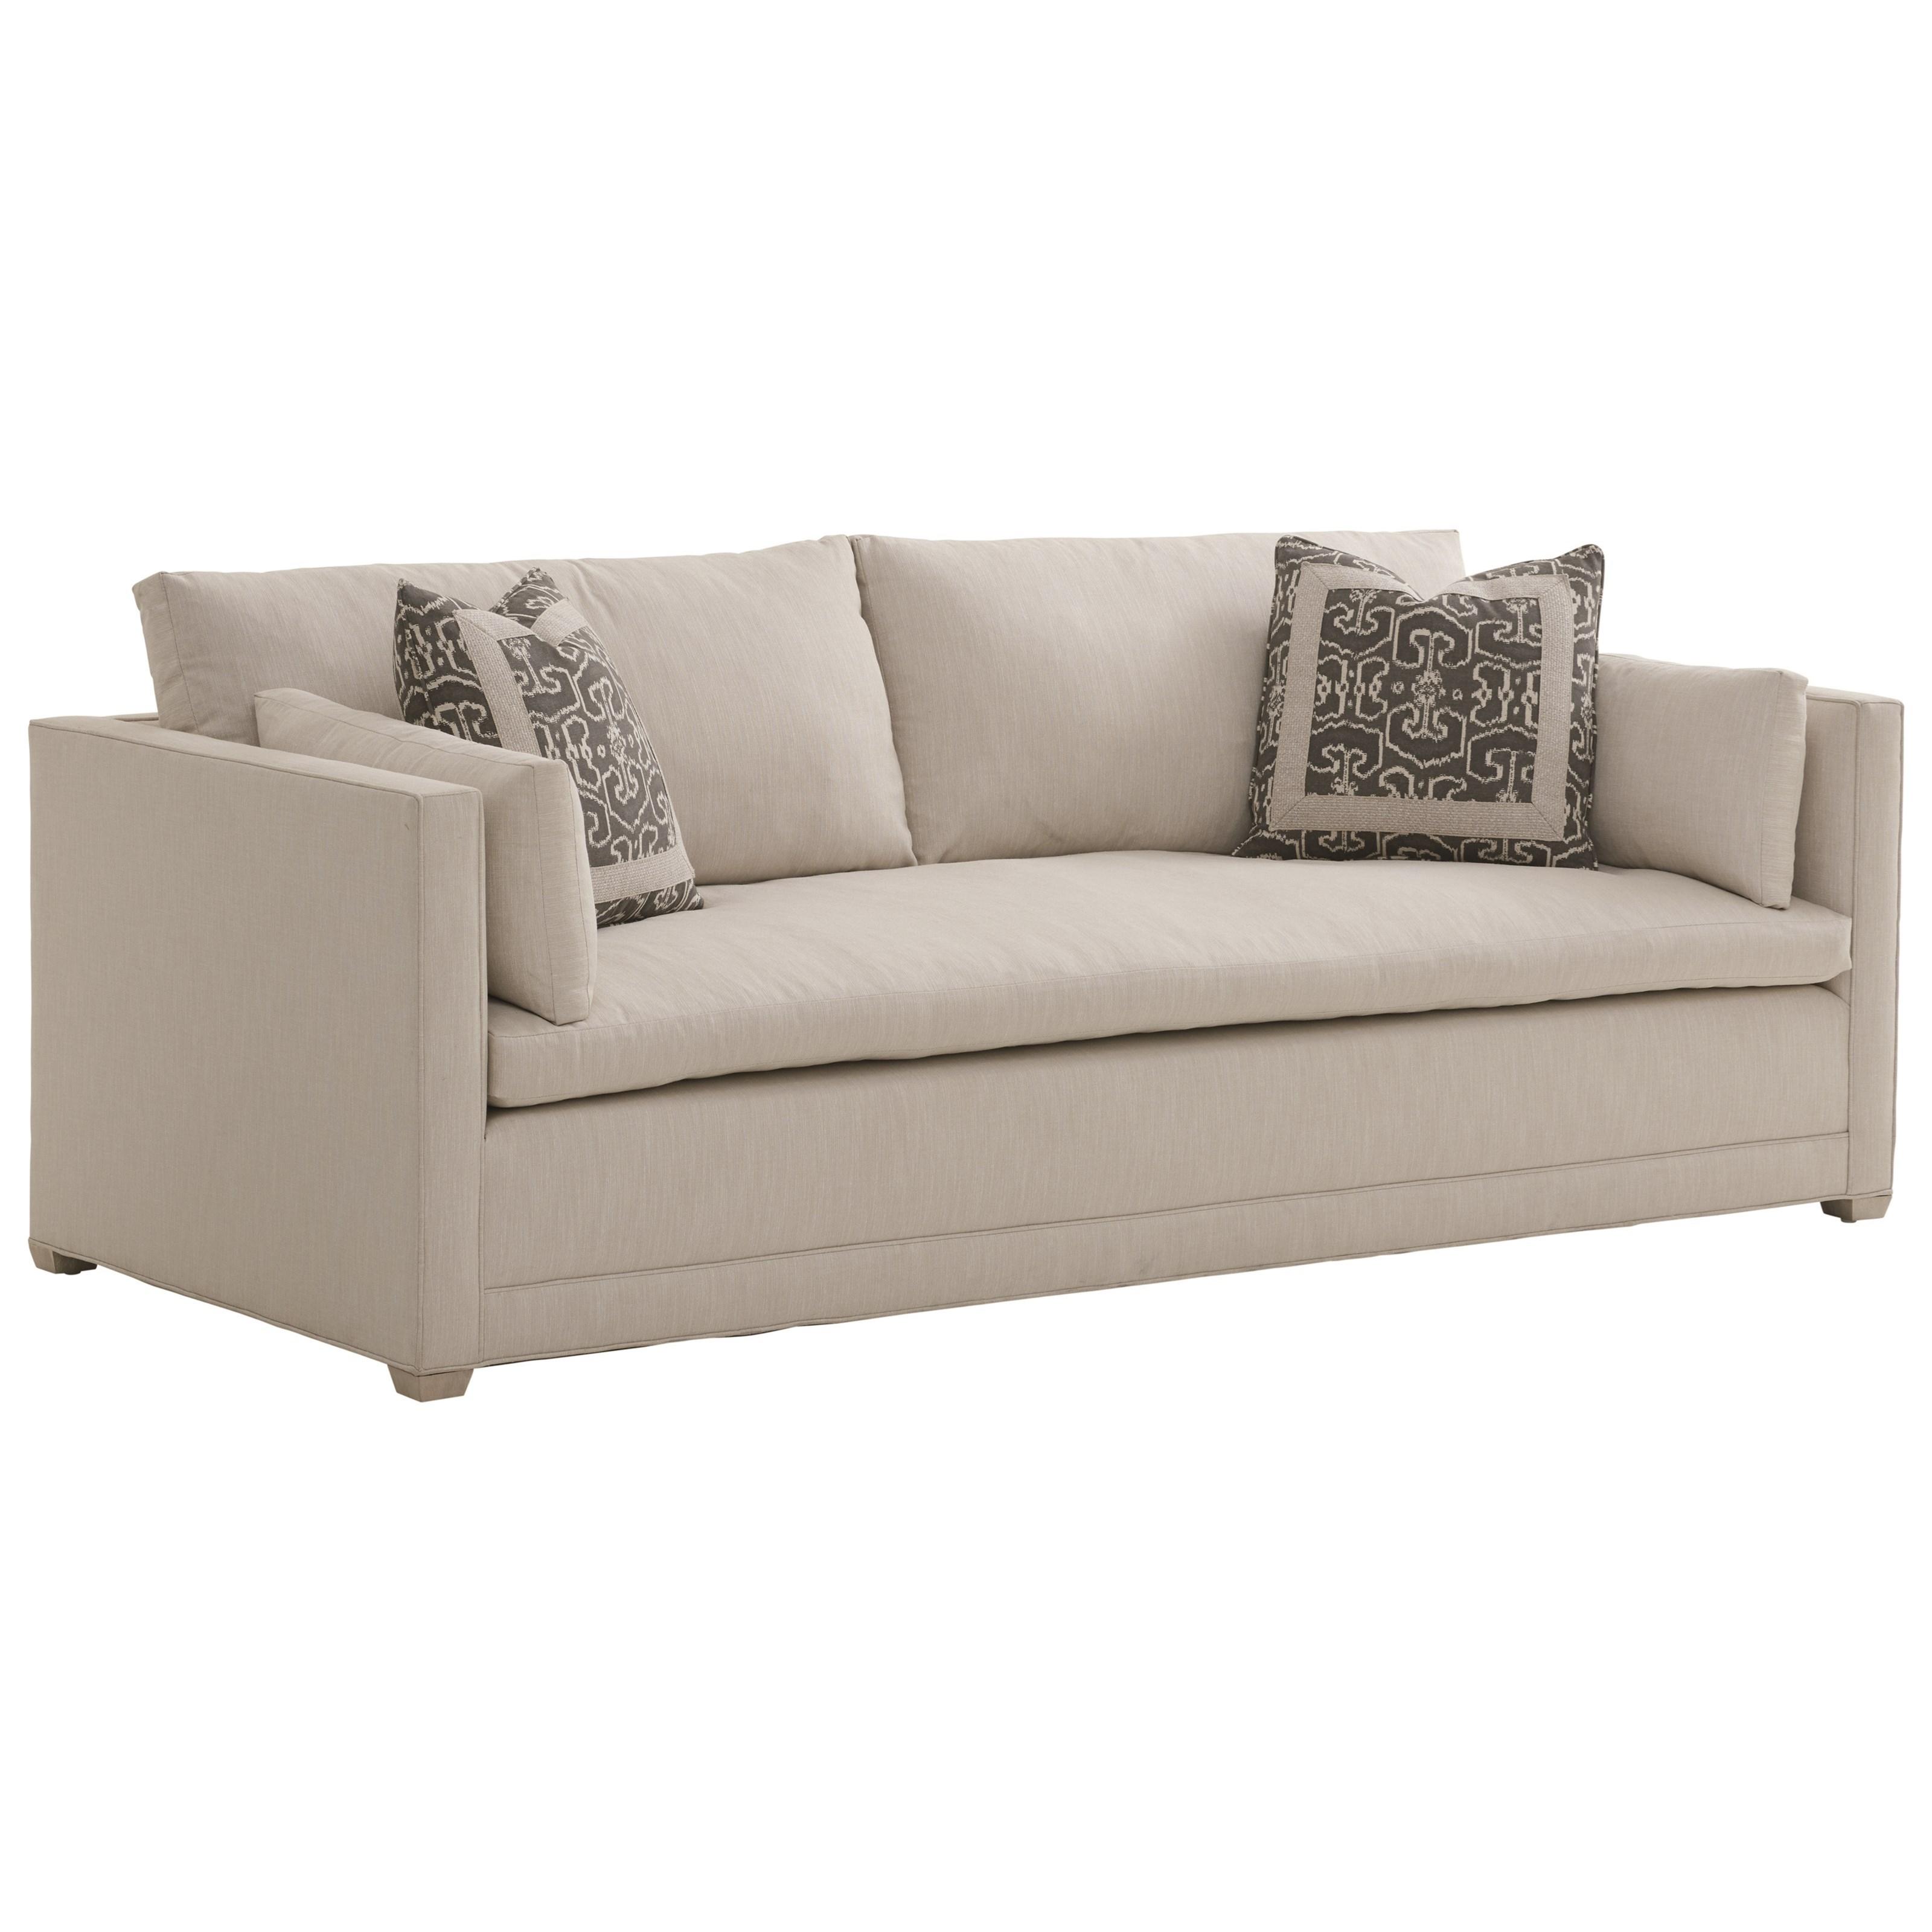 Barclay Butera Upholstery Colony Sofa by Barclay Butera at Baer's Furniture